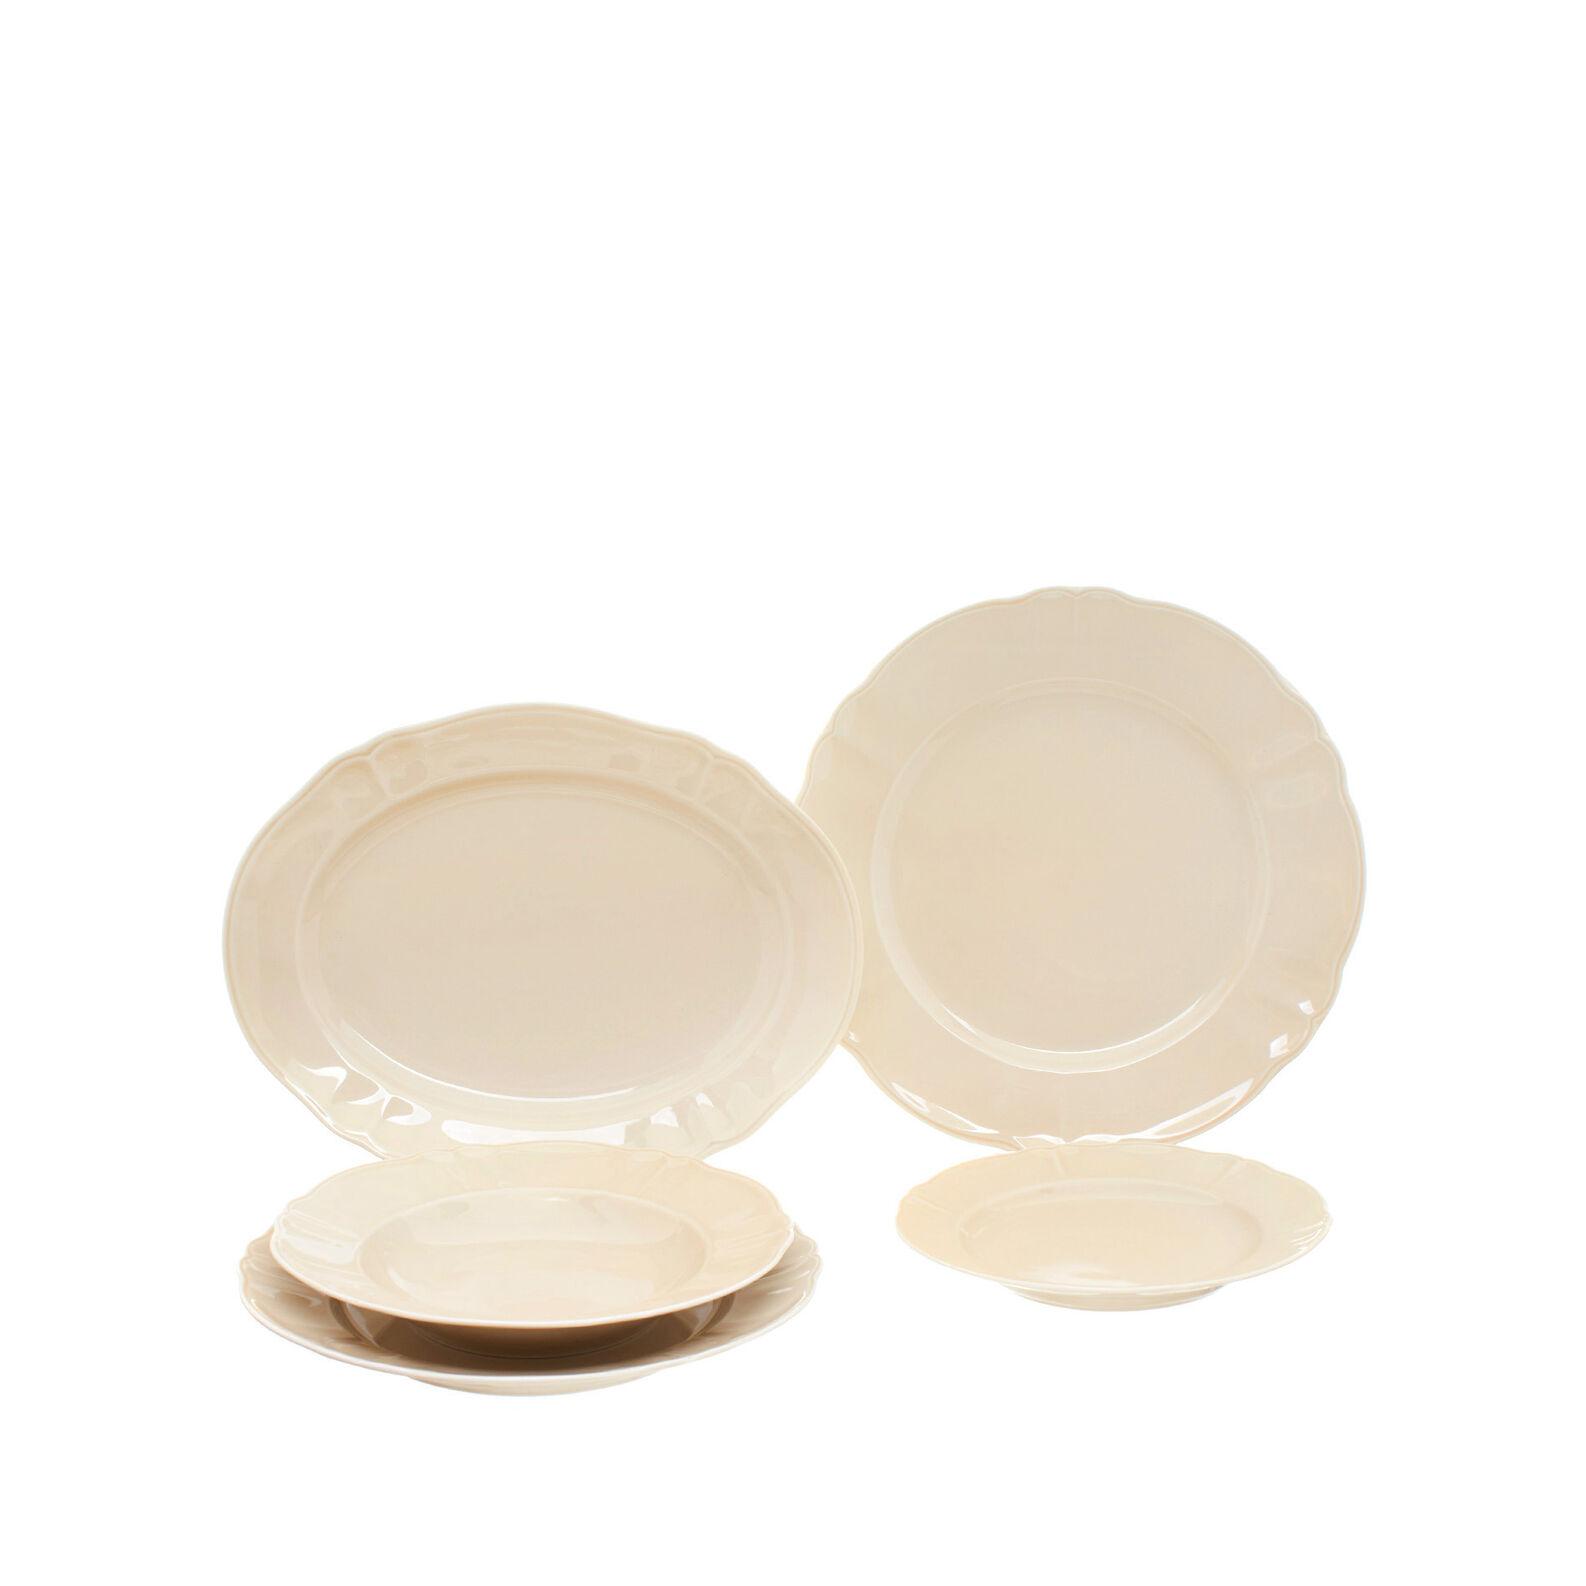 Romantic glazed china oval serving platter.